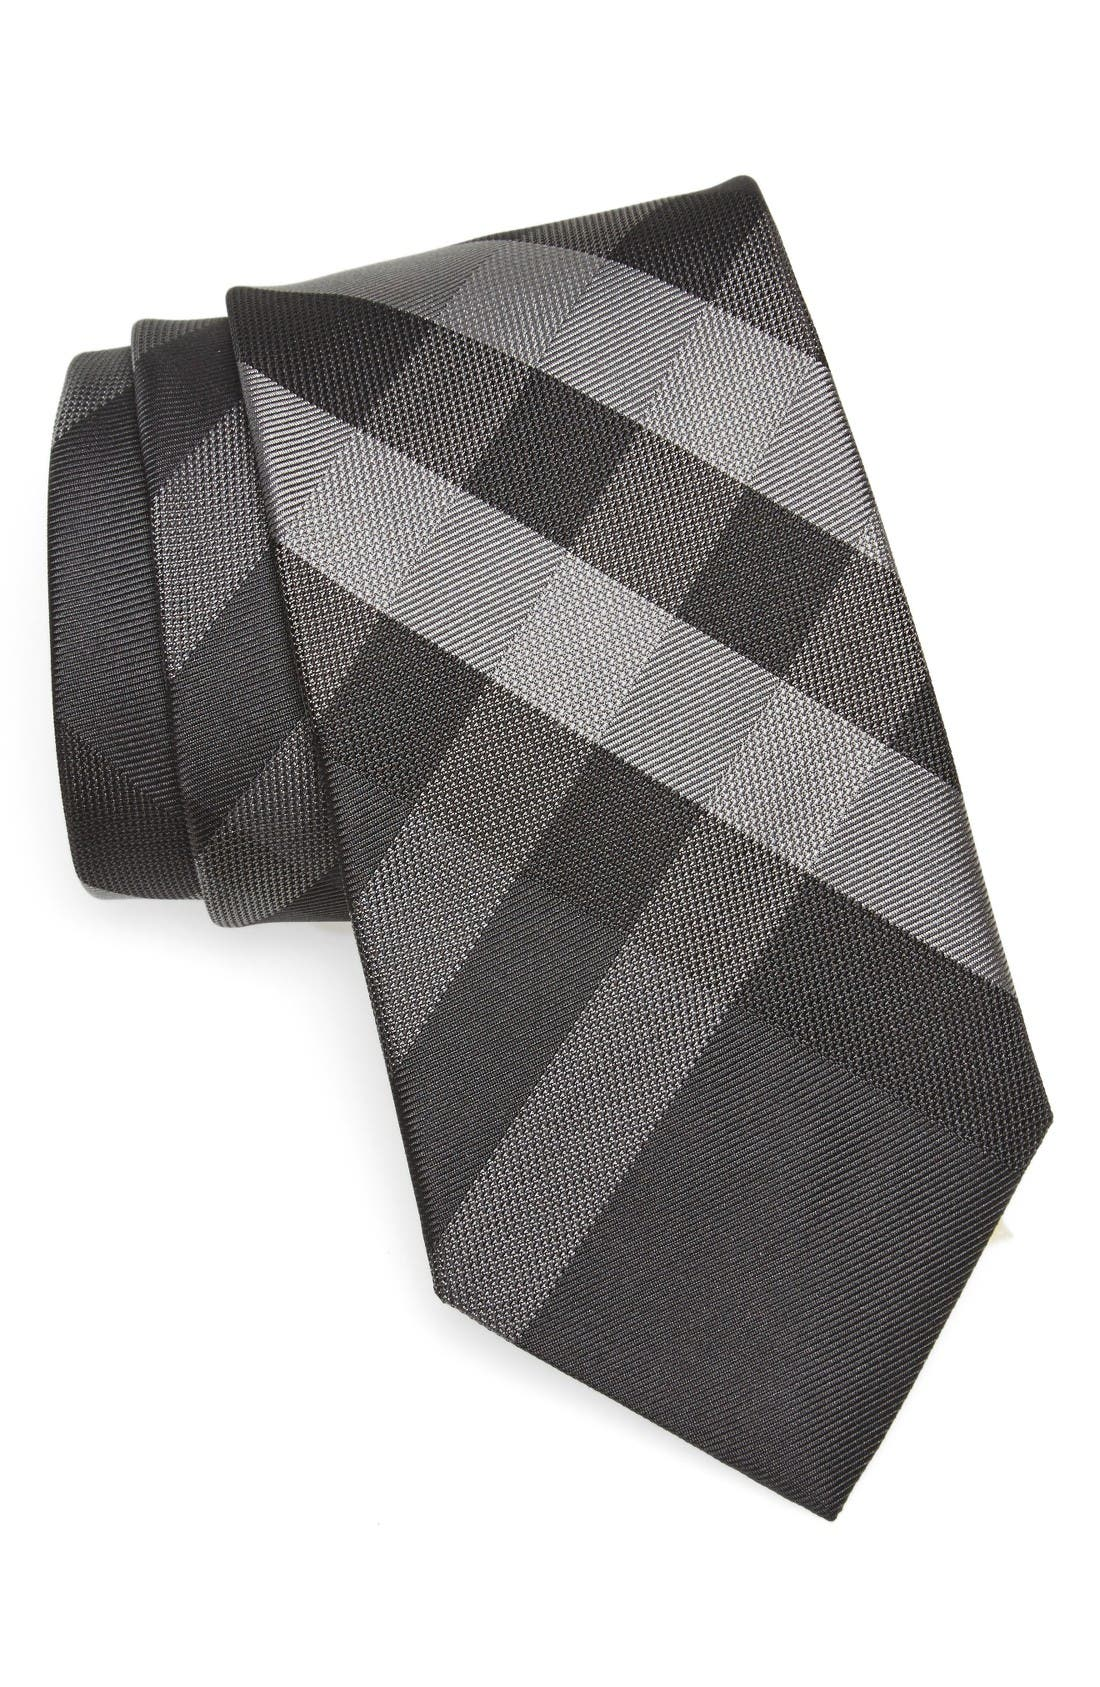 Main Image - Burberry Clinton Check Silk Tie